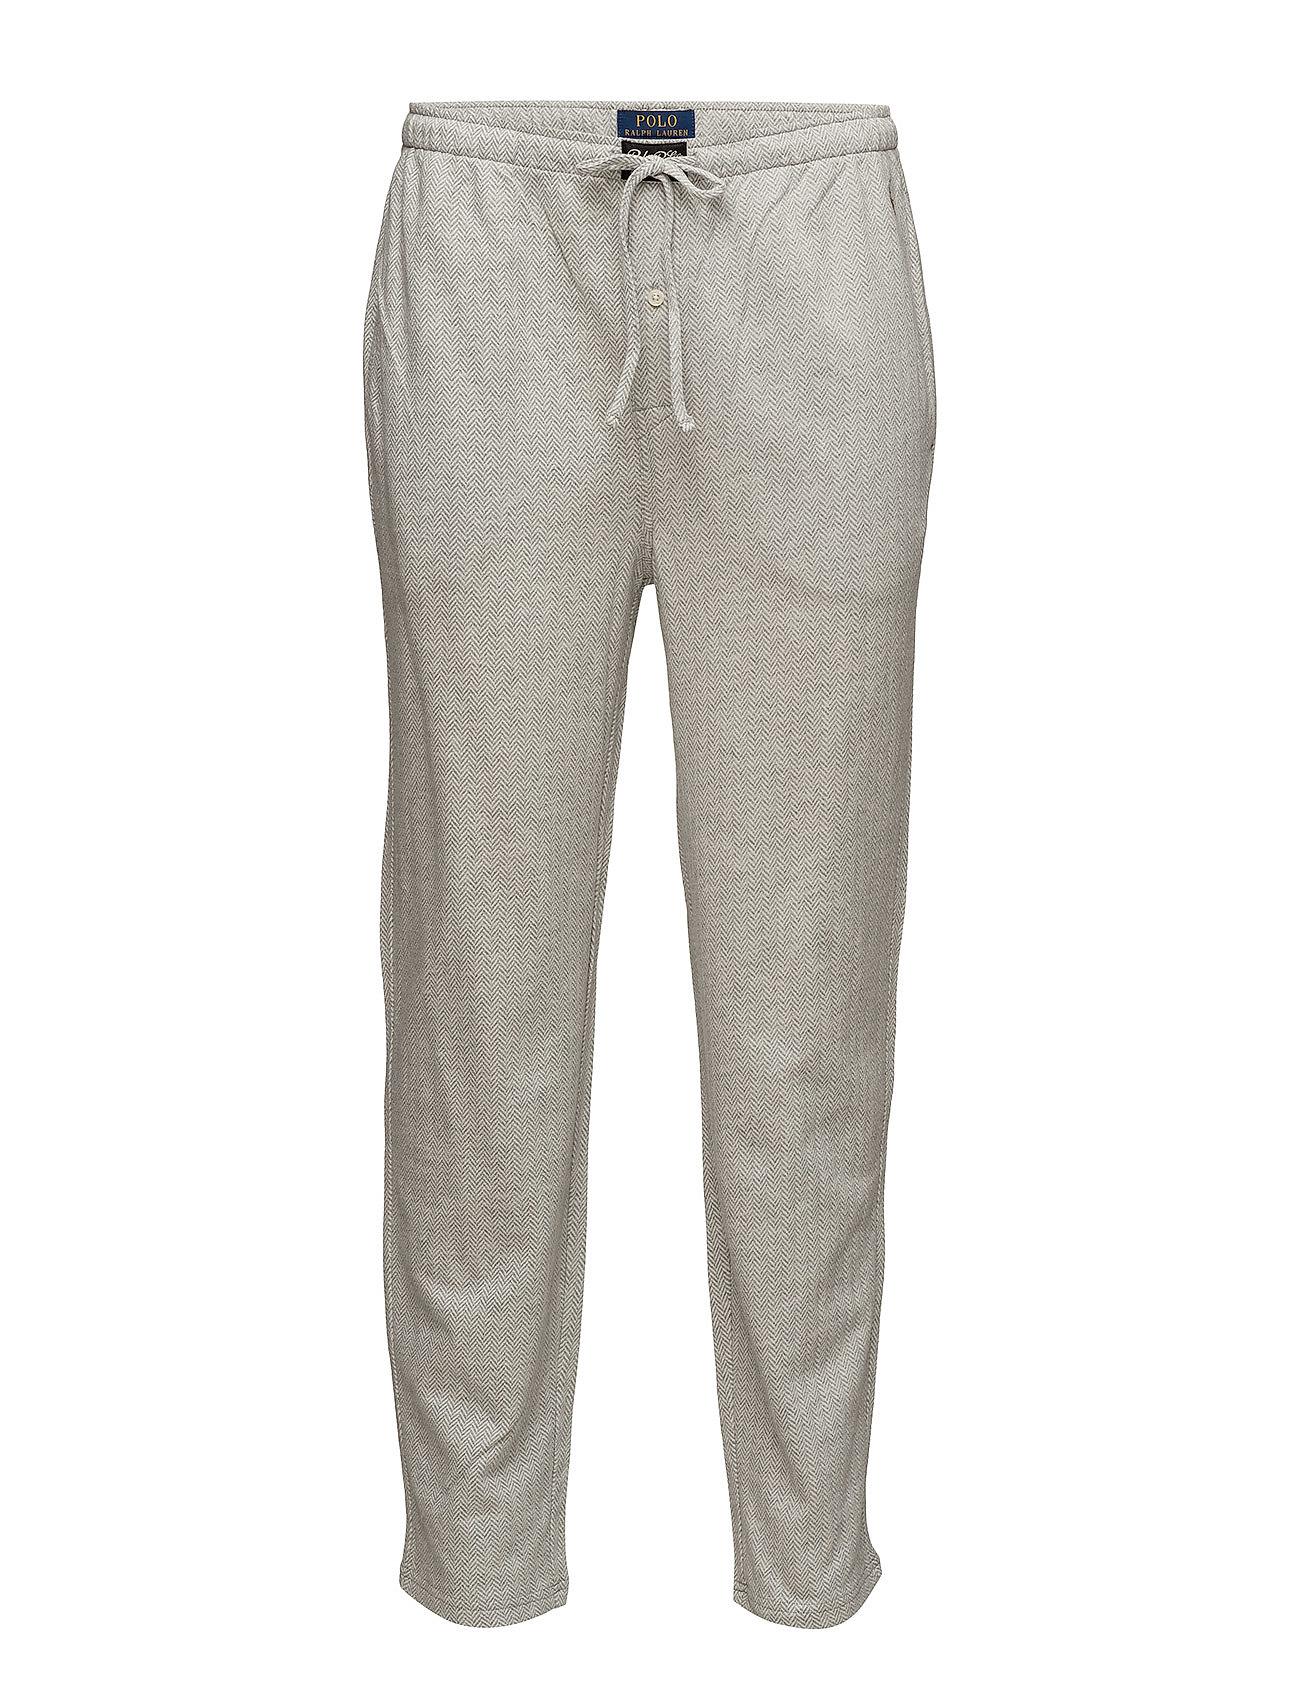 7ed00b9efba Knit Cotton Oxford Sleep Pant (Andover Heather H) (£33) - Polo Ralph ...